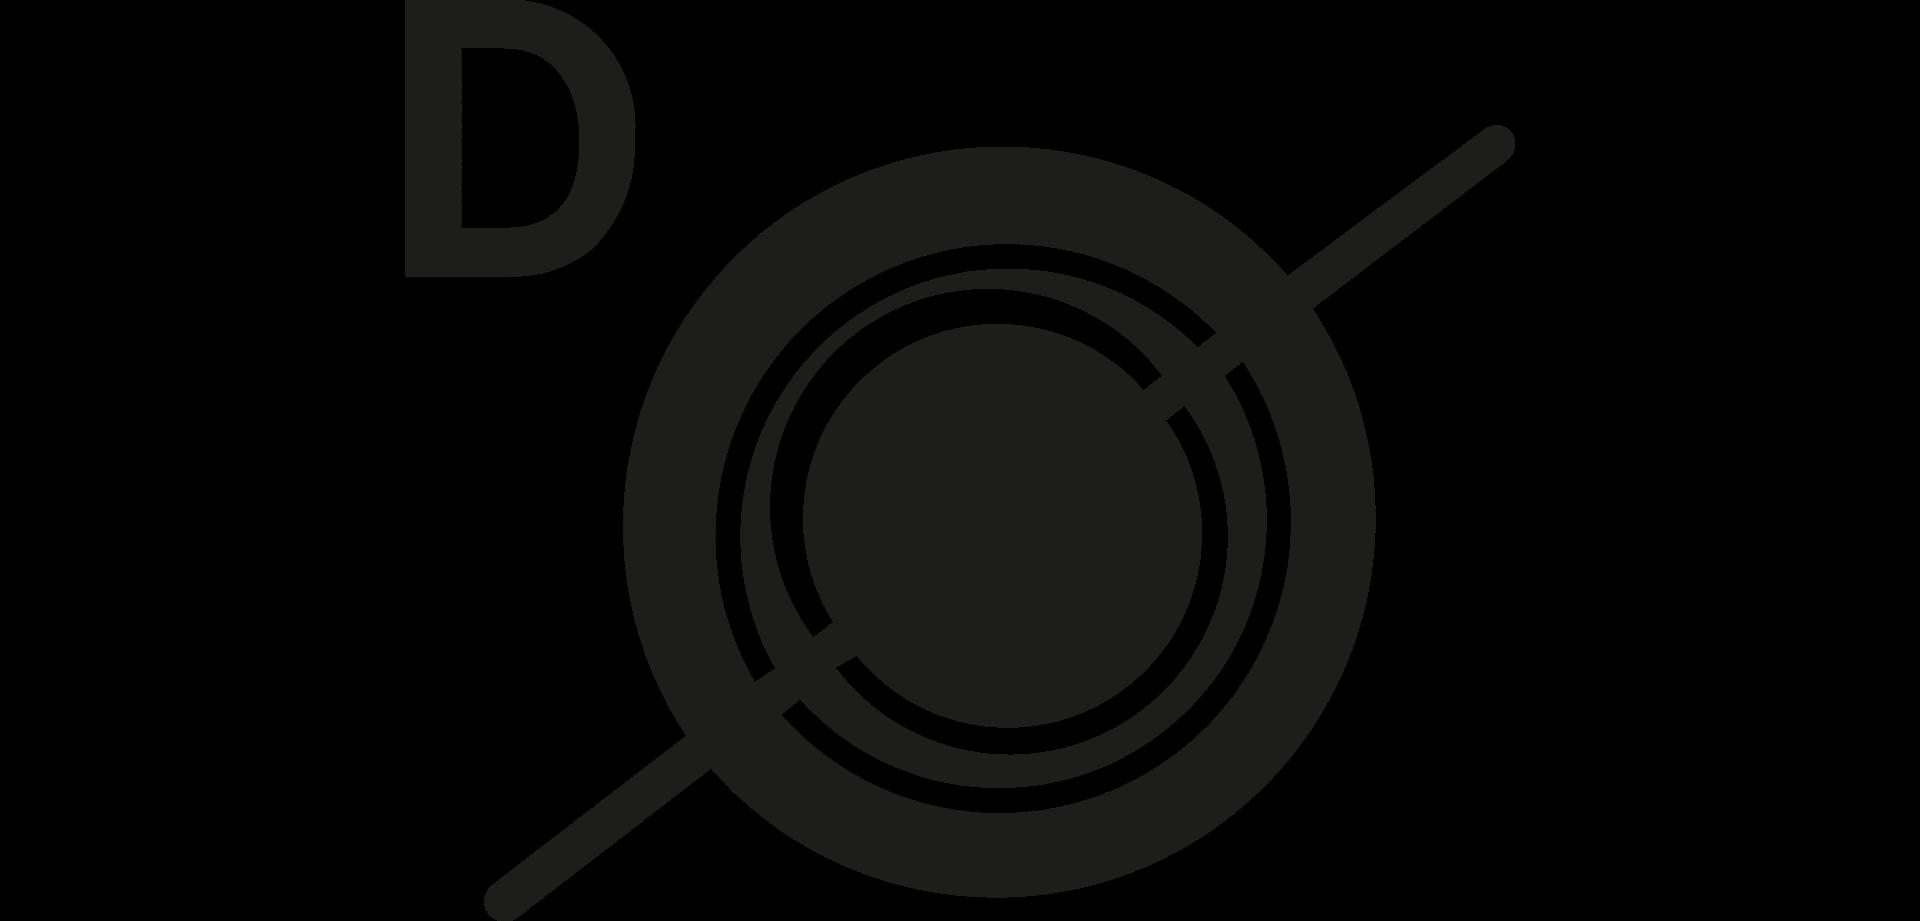 asset-diameter.png